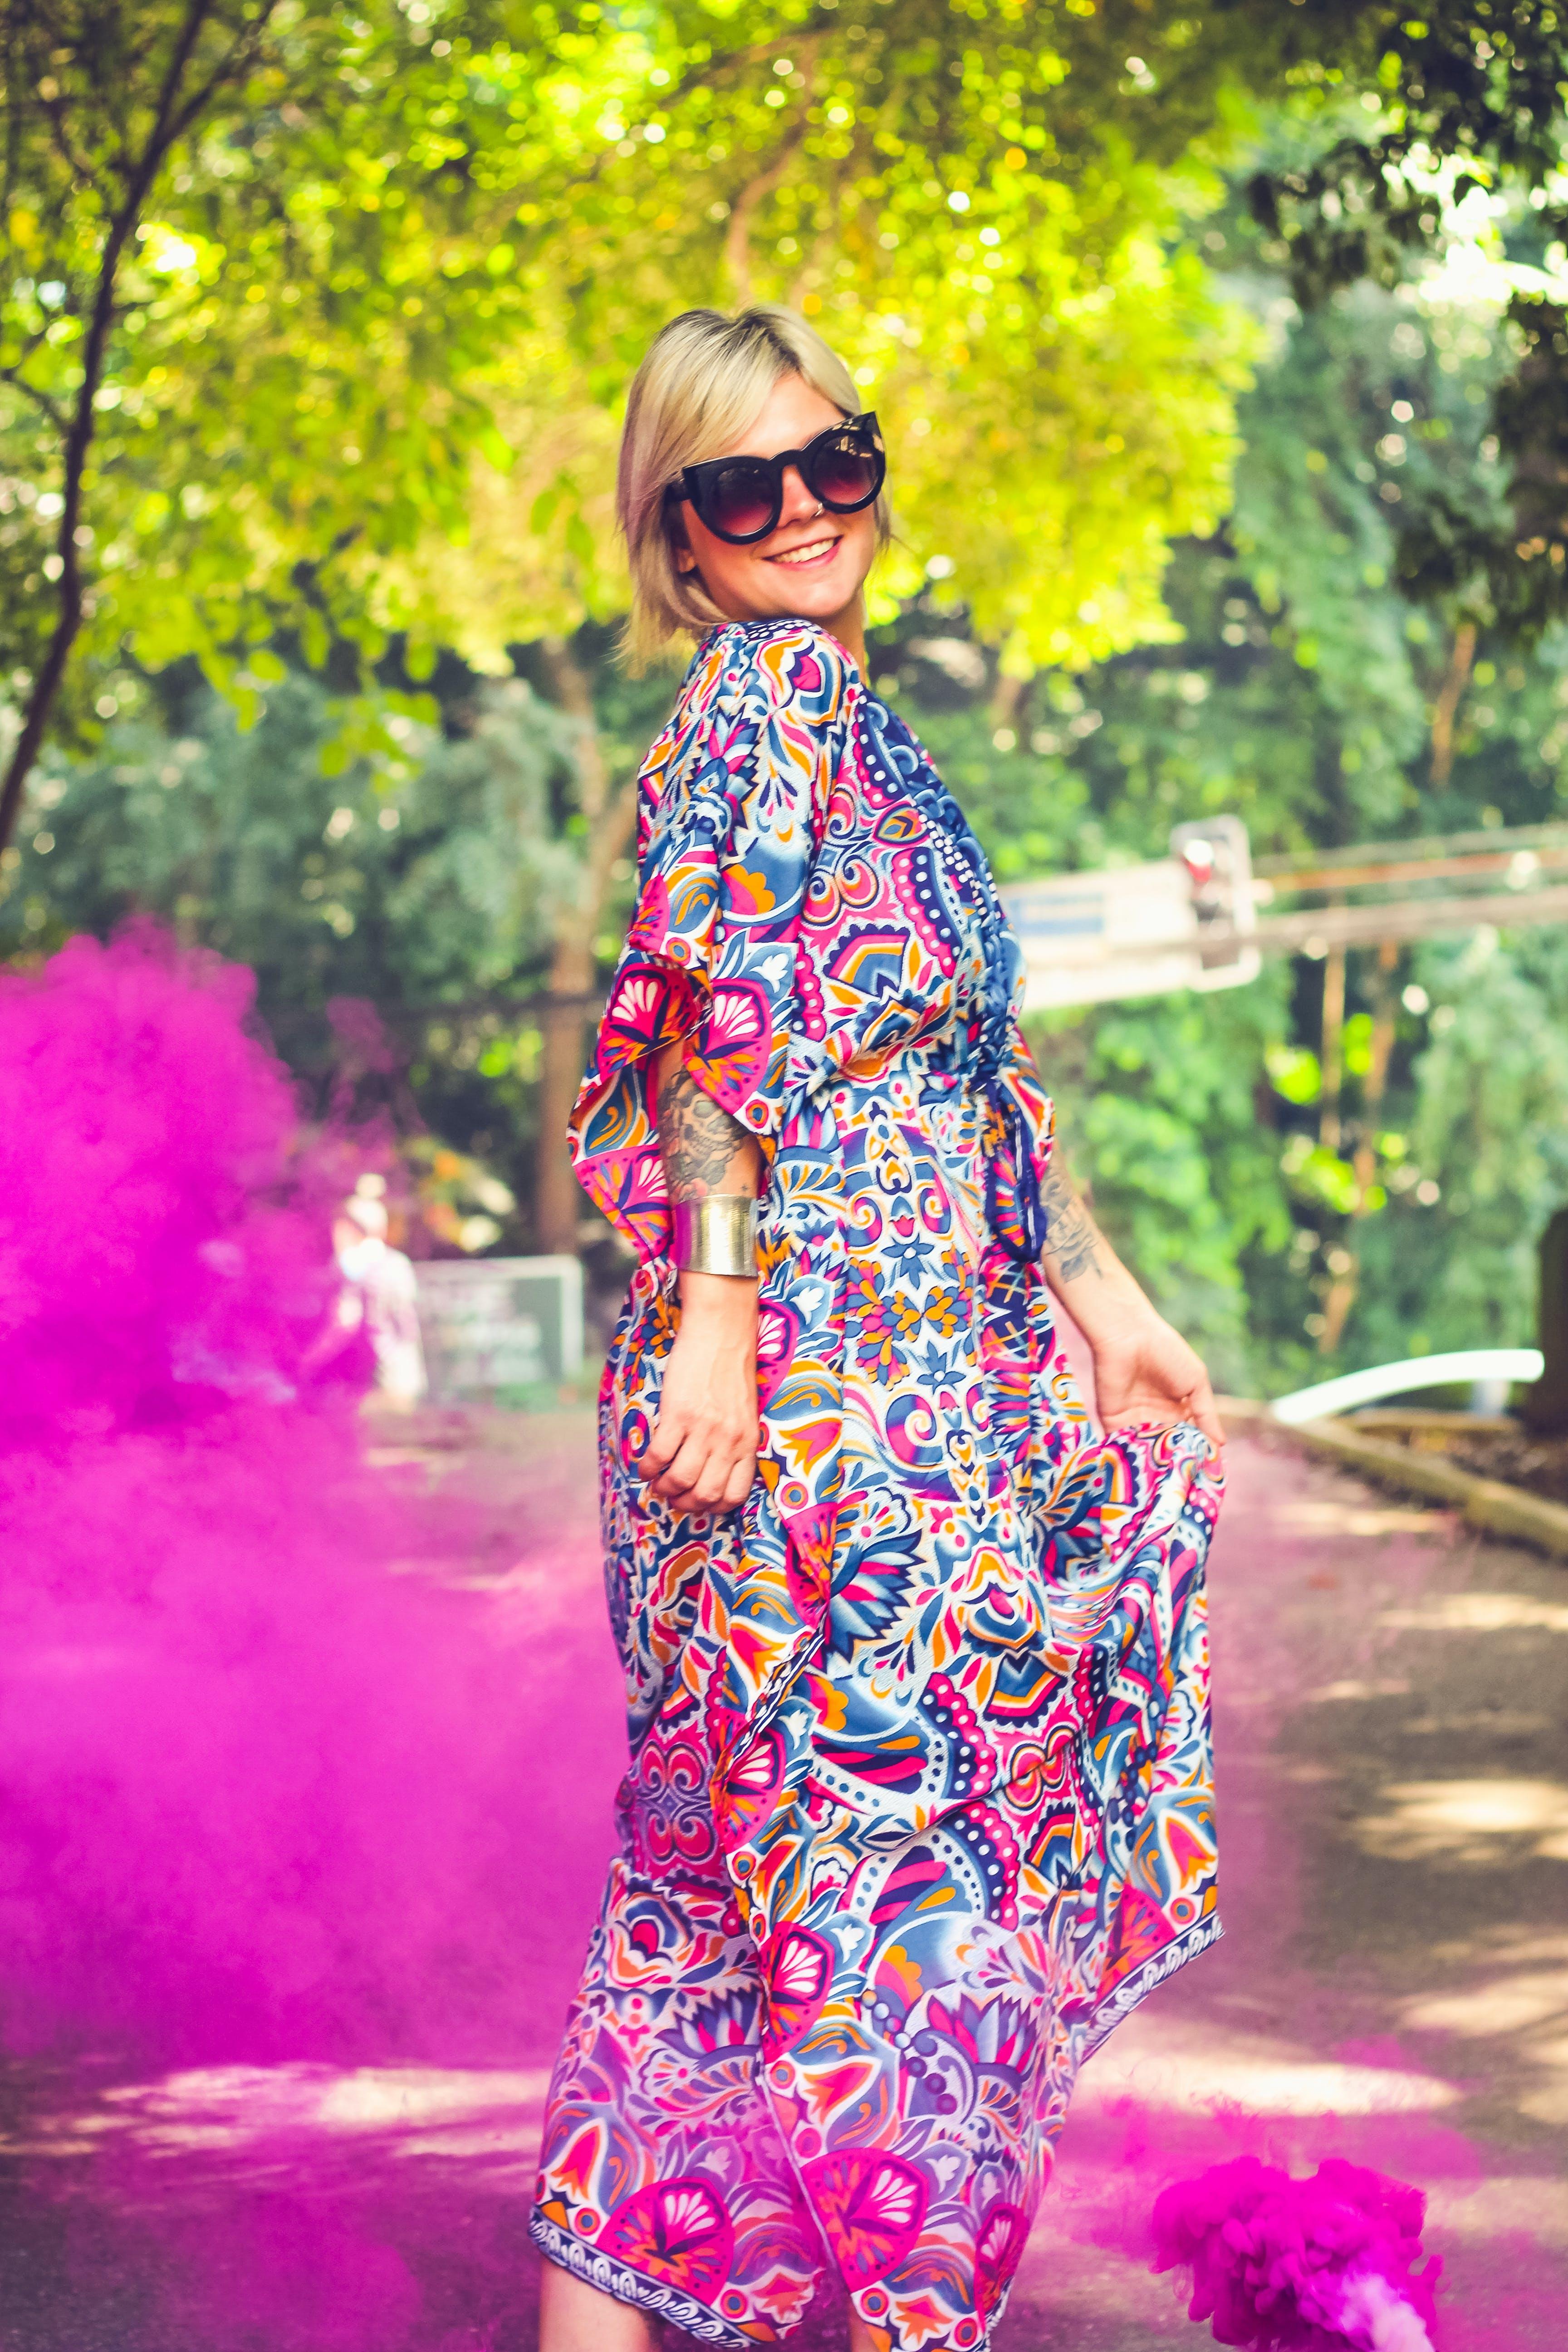 Kostenloses Stock Foto zu fashion, person, sonnenbrille, frau